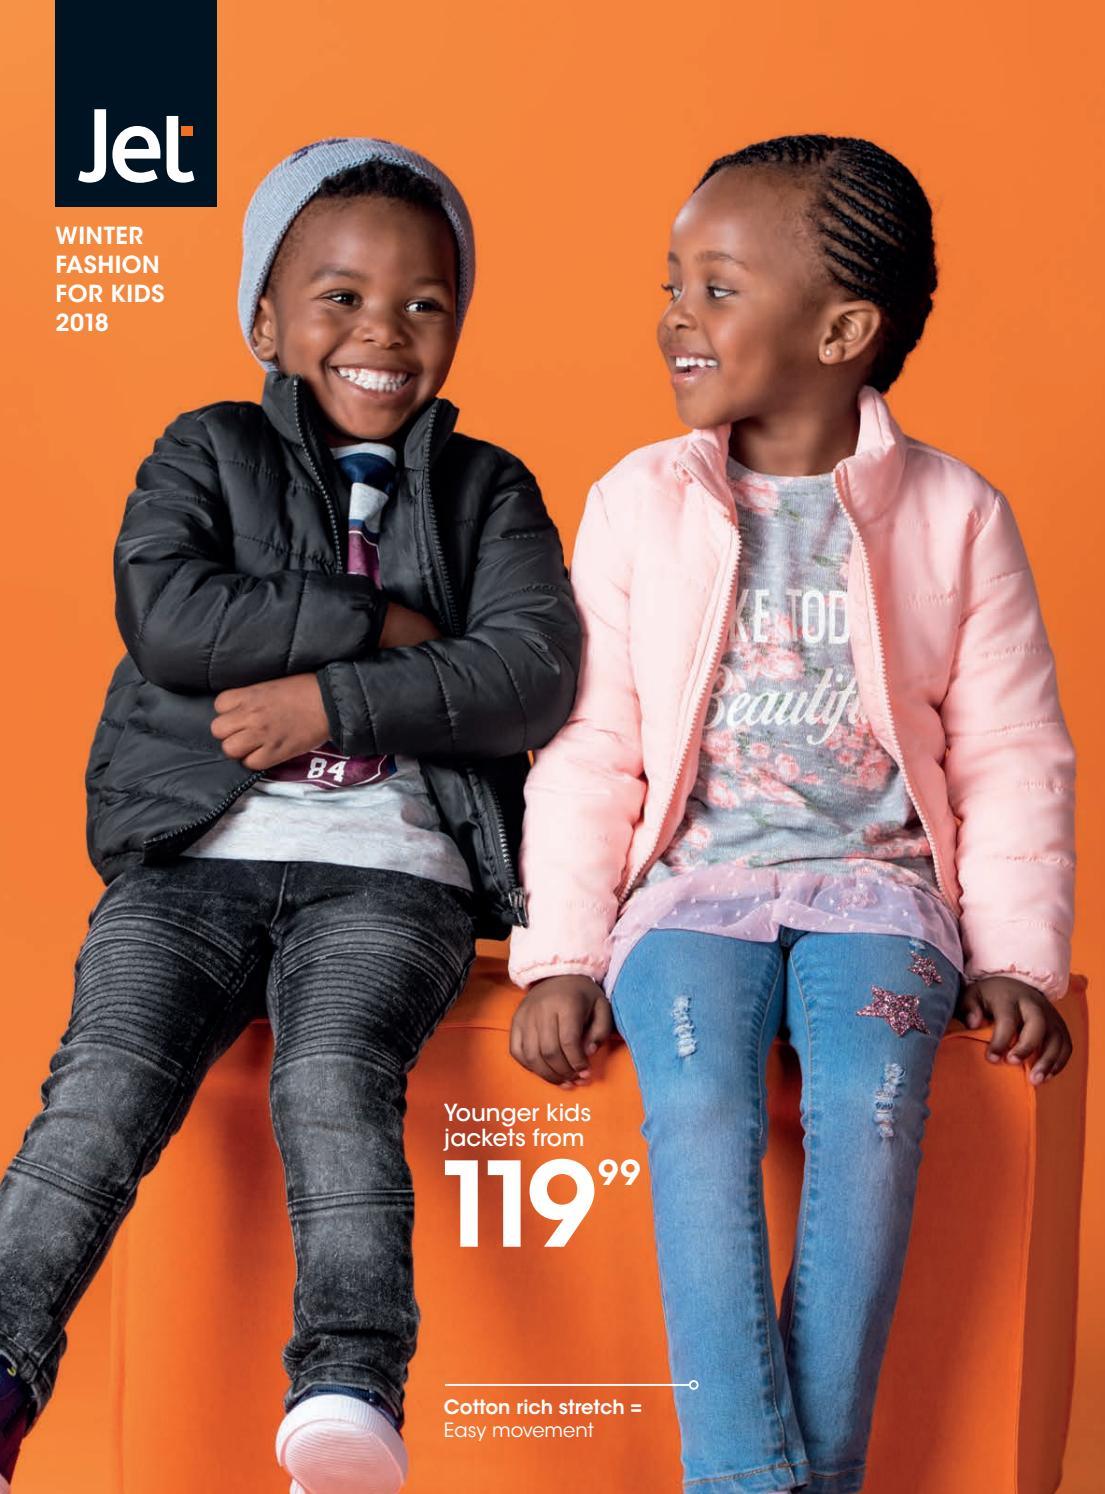 910e2f9d Jet tw 1 2 april 2018 kids winter digital catalogue by Edcon - issuu